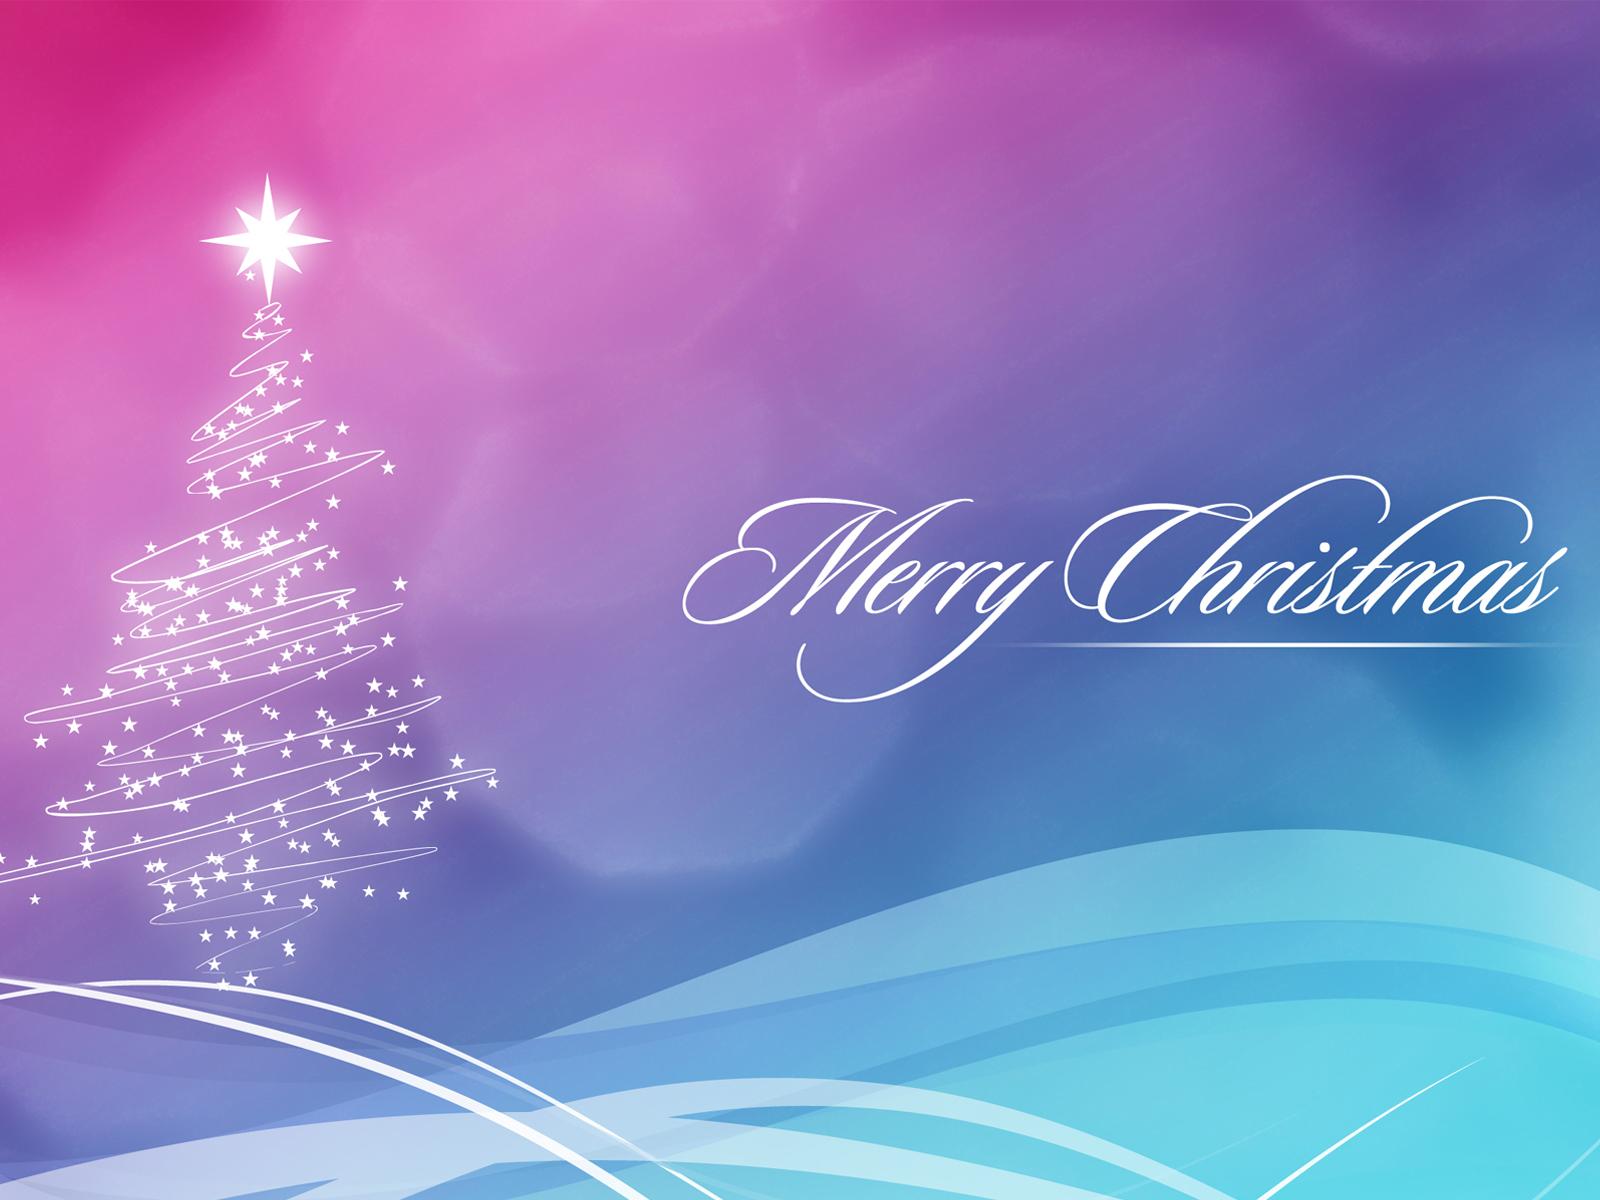 Frasi di auguri Buon Natale